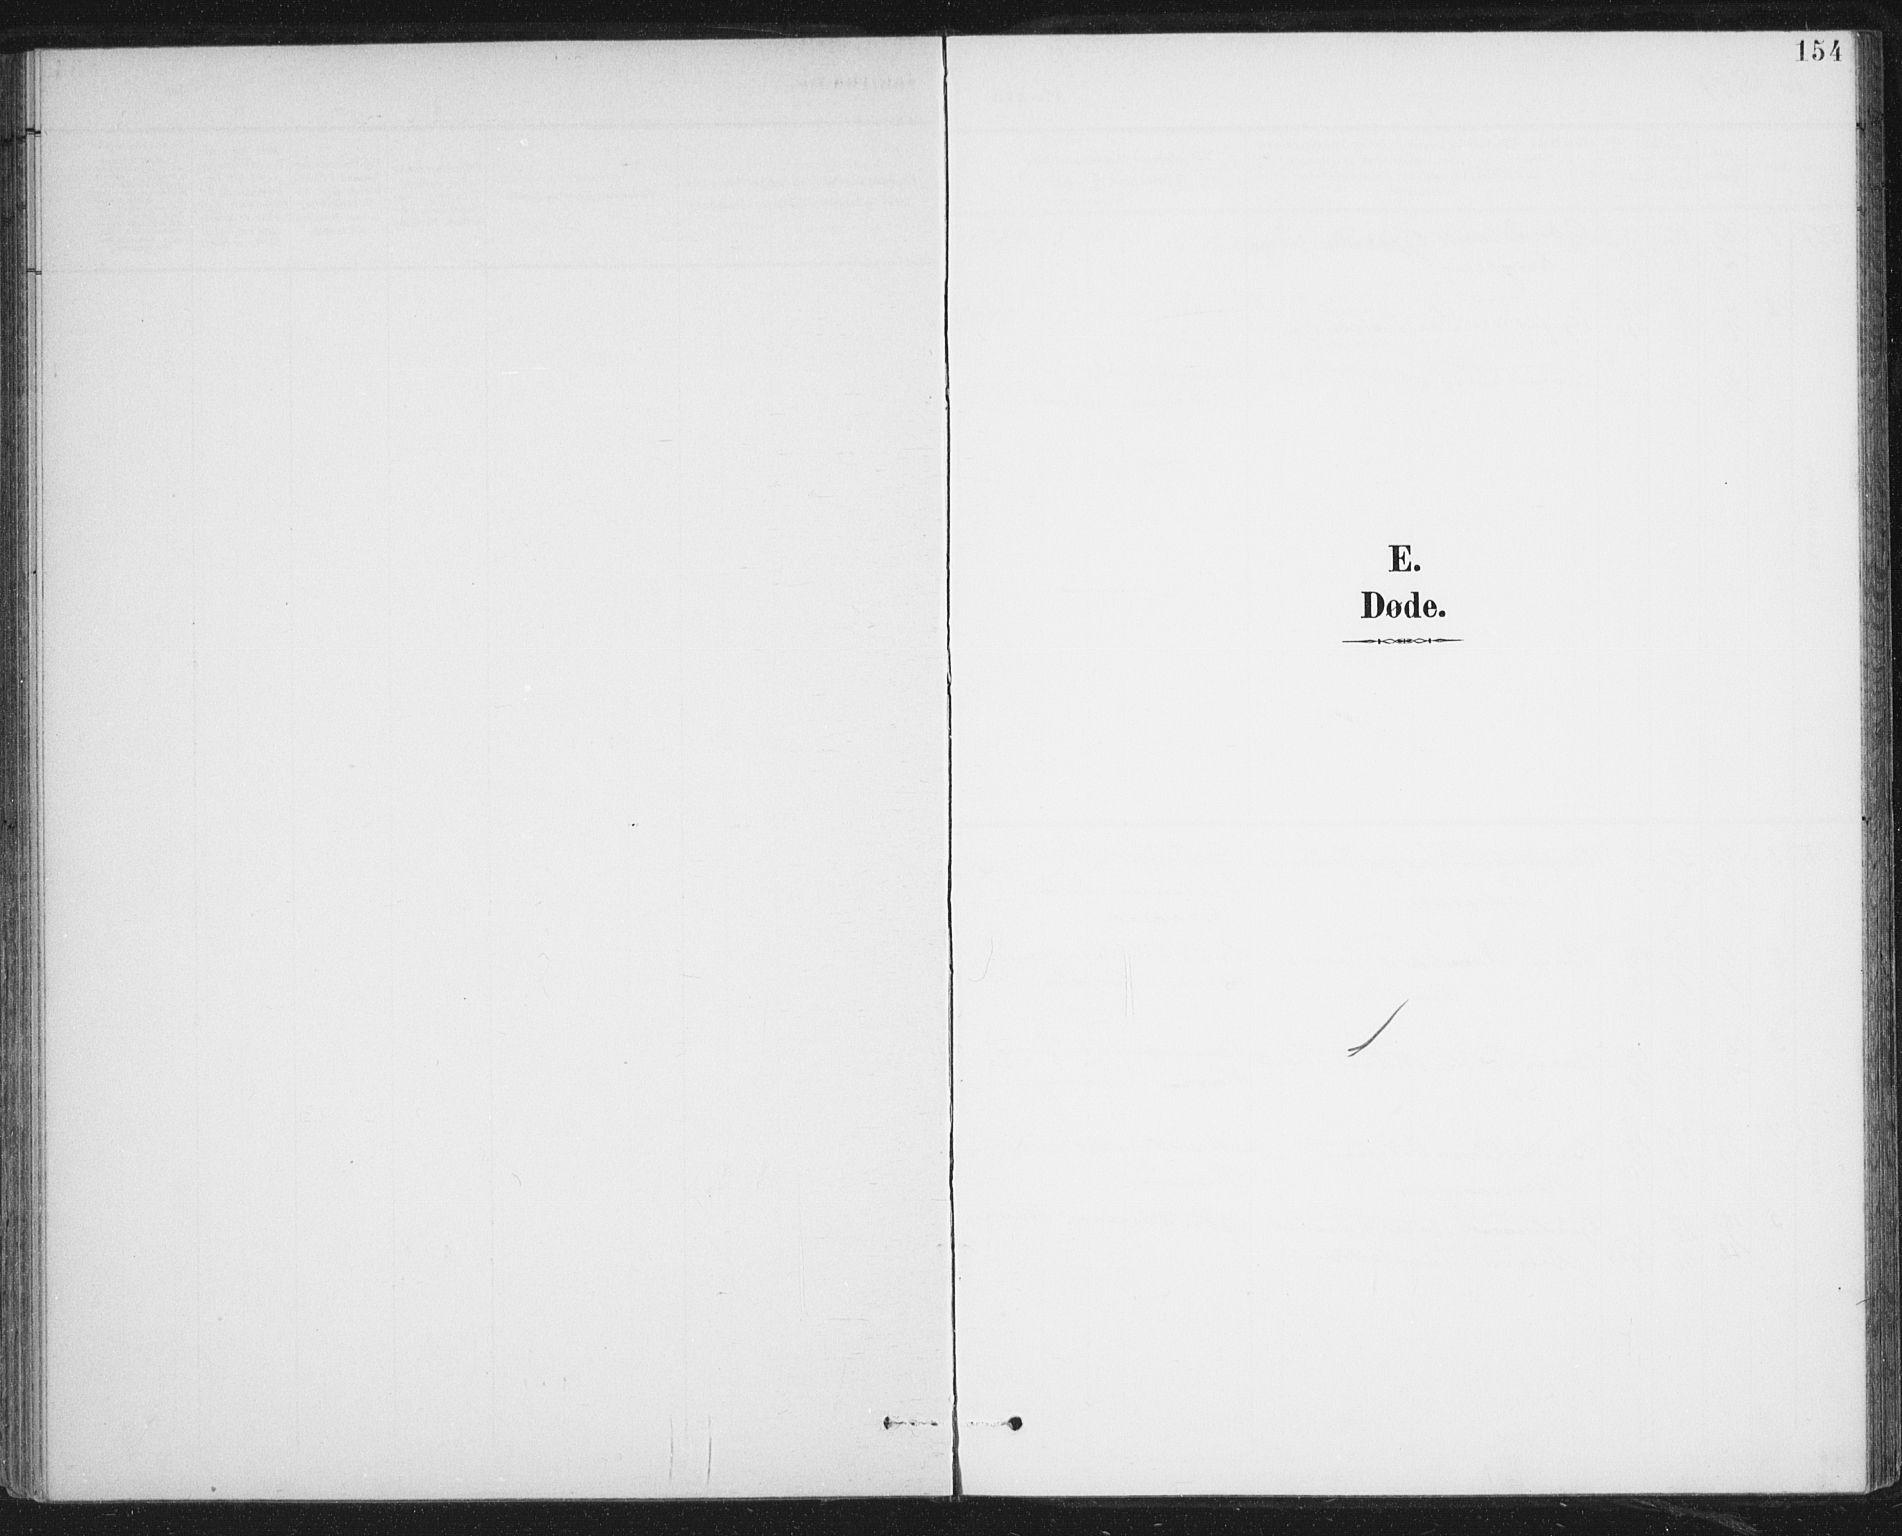 SAT, Ministerialprotokoller, klokkerbøker og fødselsregistre - Nordland, 899/L1437: Ministerialbok nr. 899A05, 1897-1908, s. 154